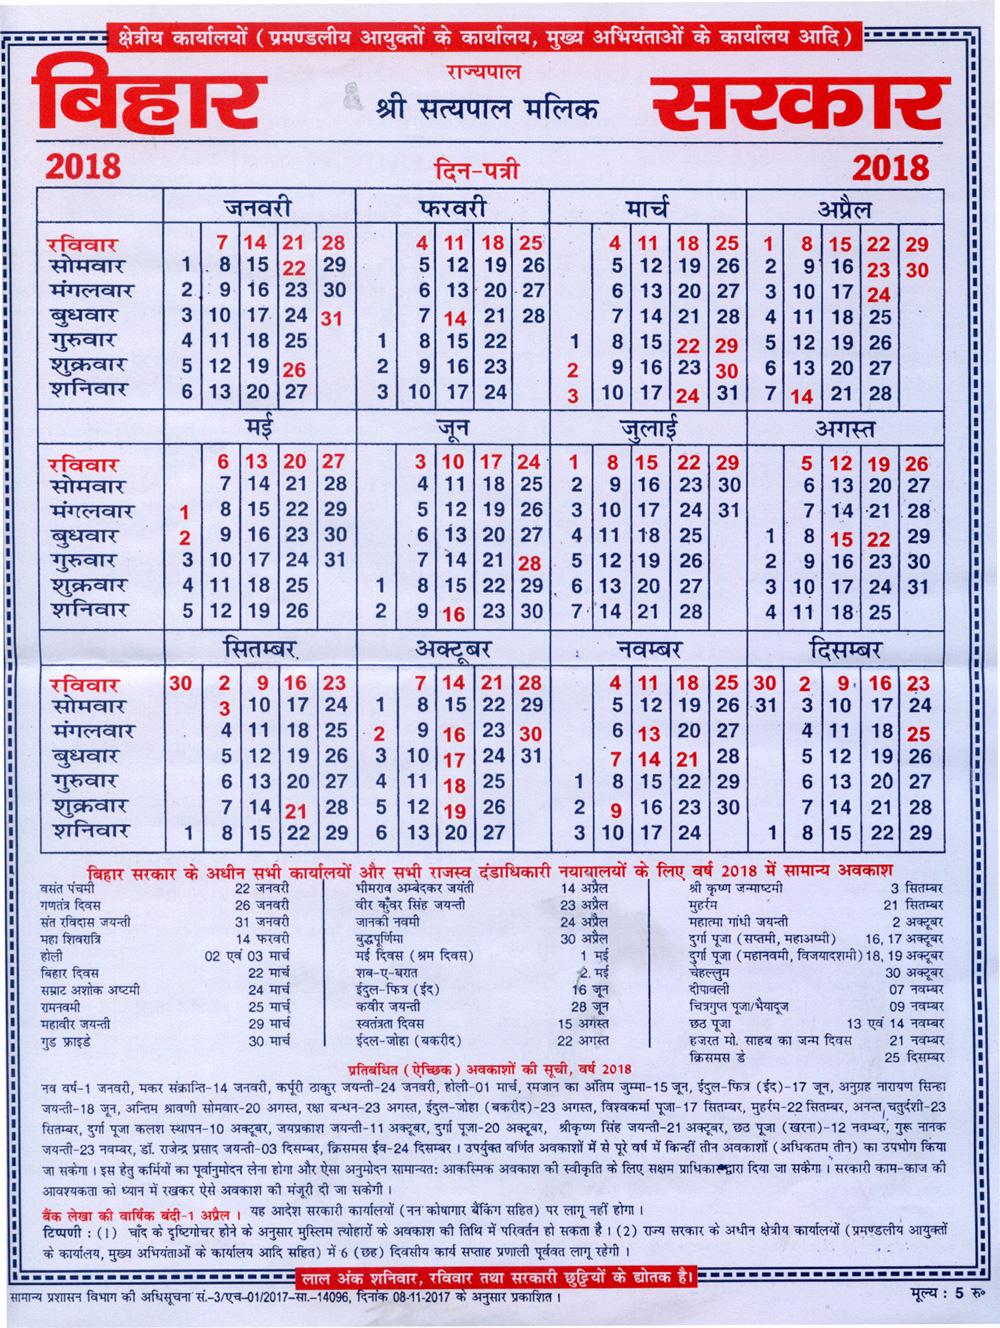 Bihar Govt. Calendar 2018, Bihar Govt. Holiday List, Holiday in Bihar Govt Holidays 2020